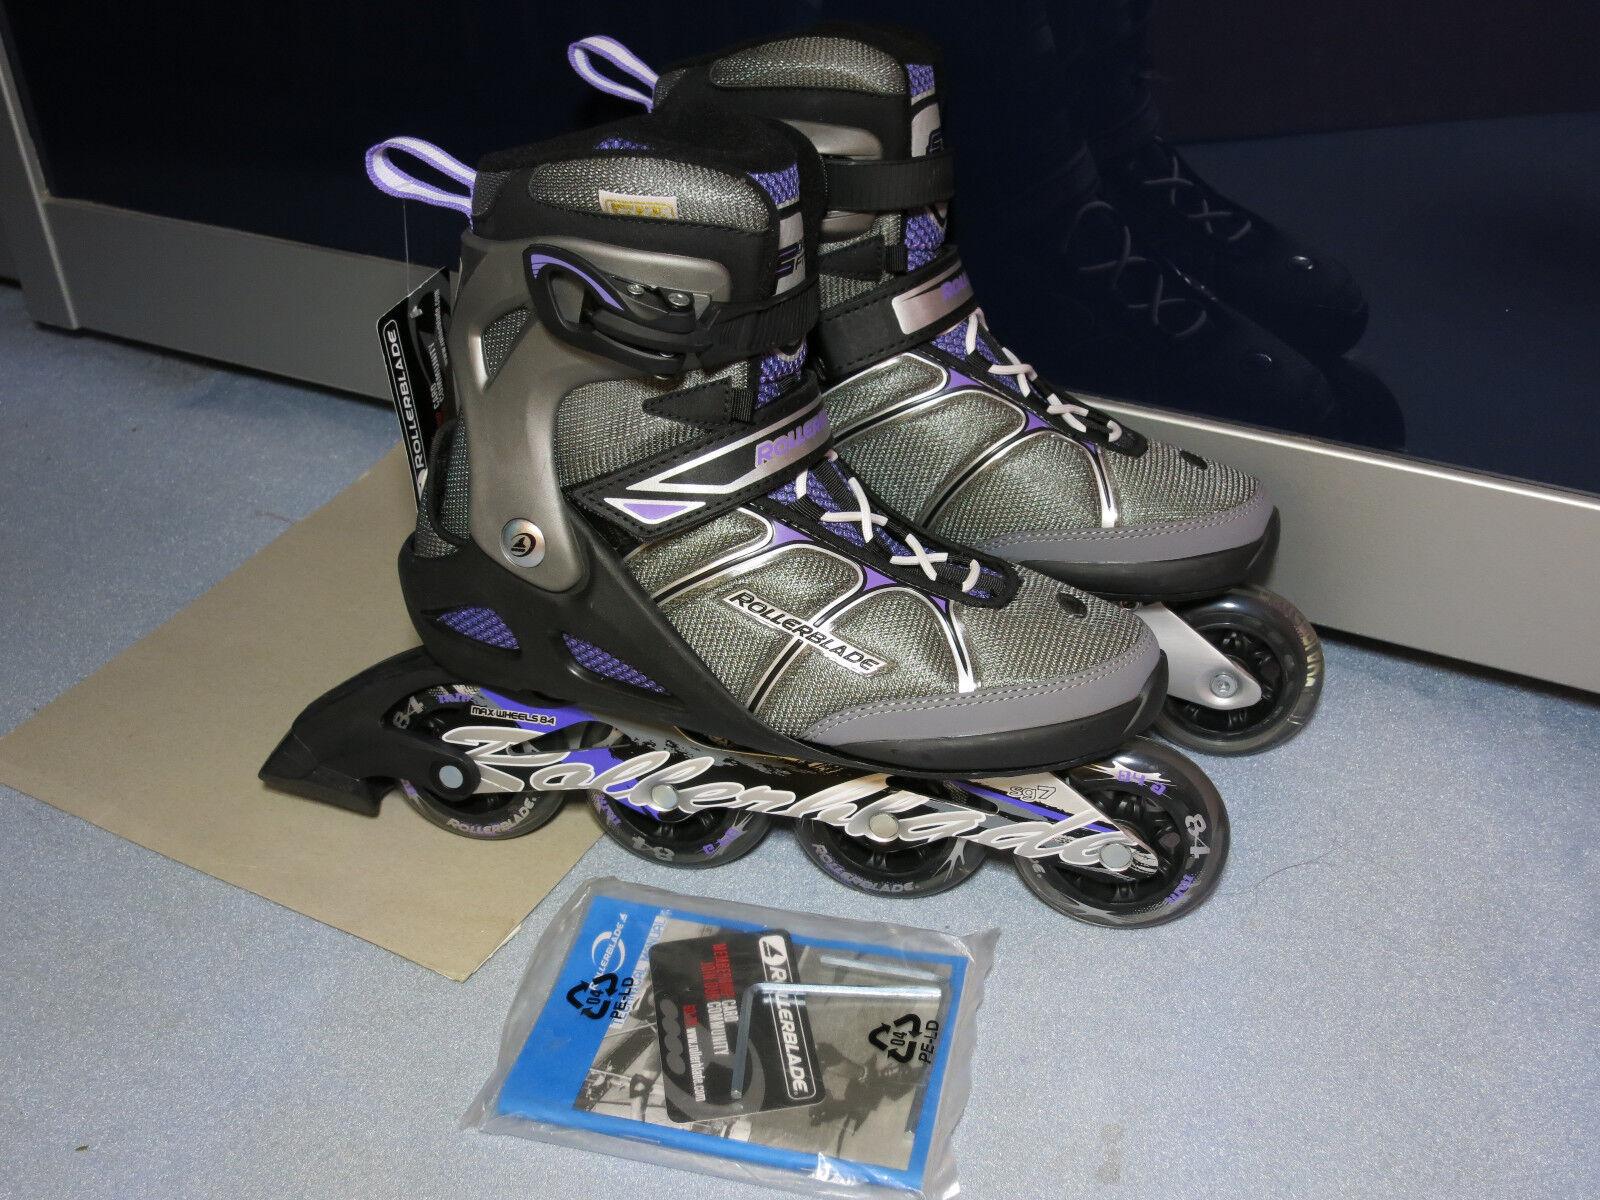 Rollerblade Macroblade 84 Alu LILA LILA Alu Skates Inliner Größe 42,5 NEU  k2 NP 179,95 a54b13